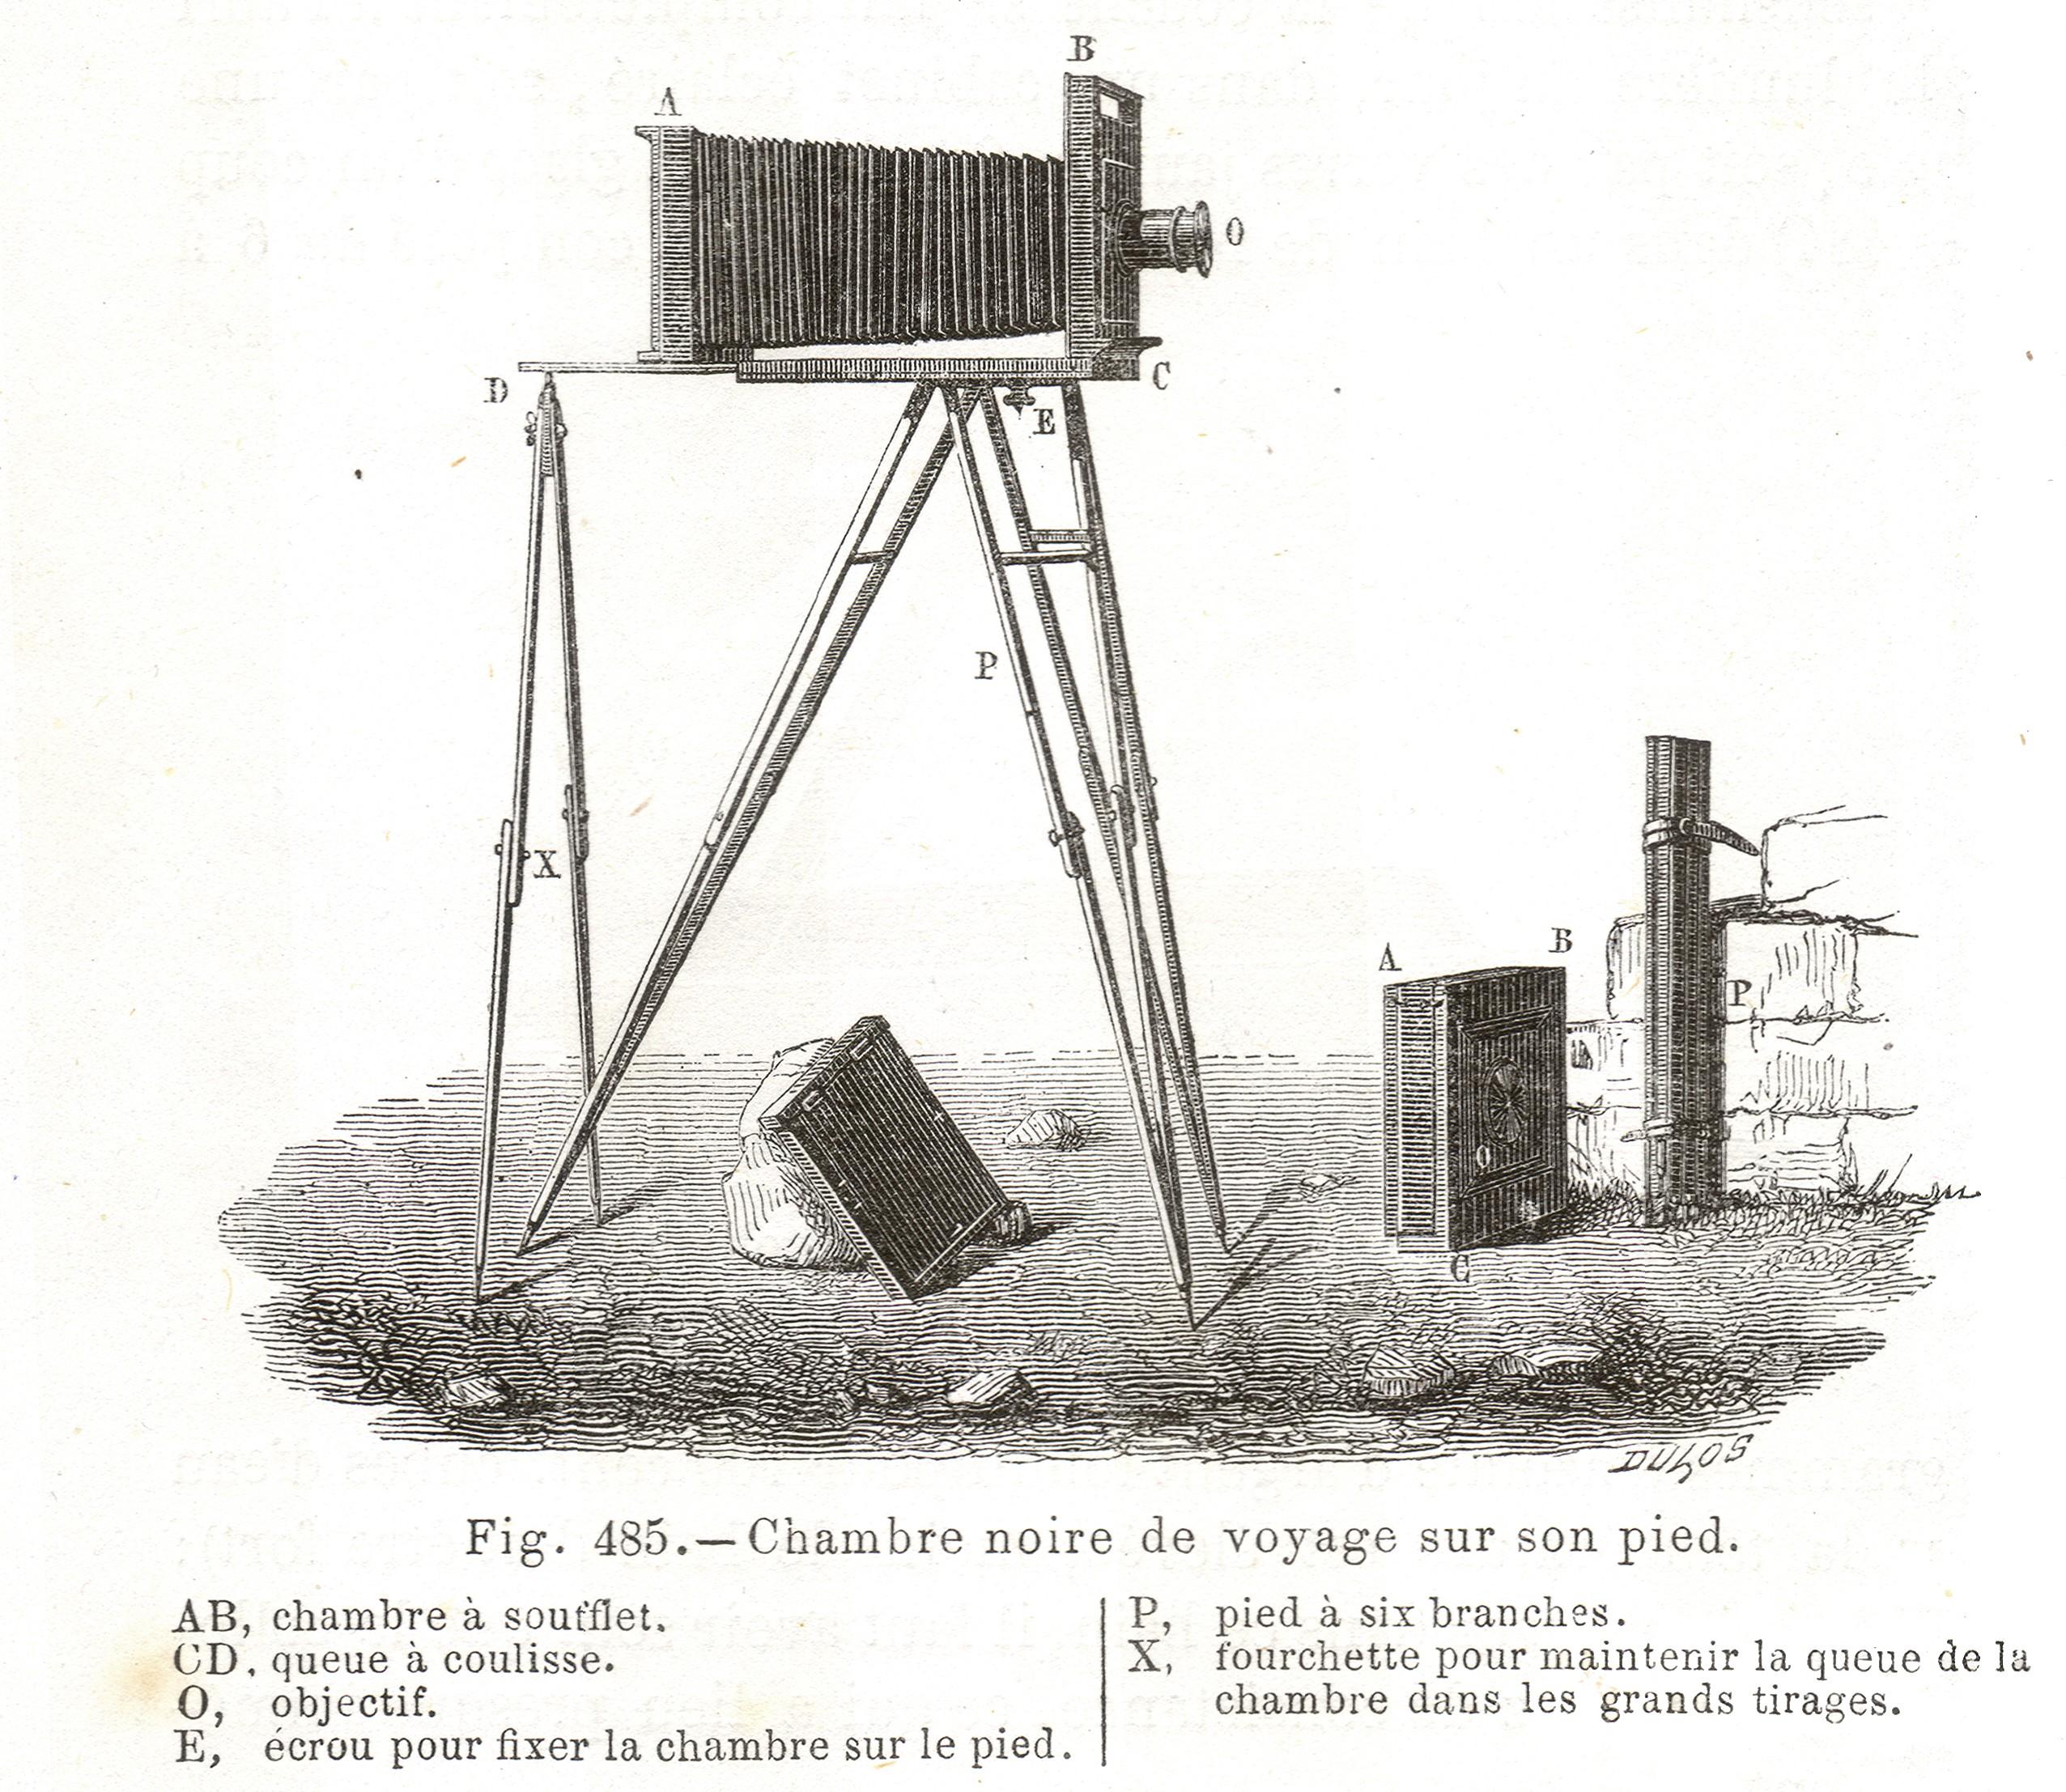 Chambre Noire Photographie : File chambre noir voyage g wikimedia commons